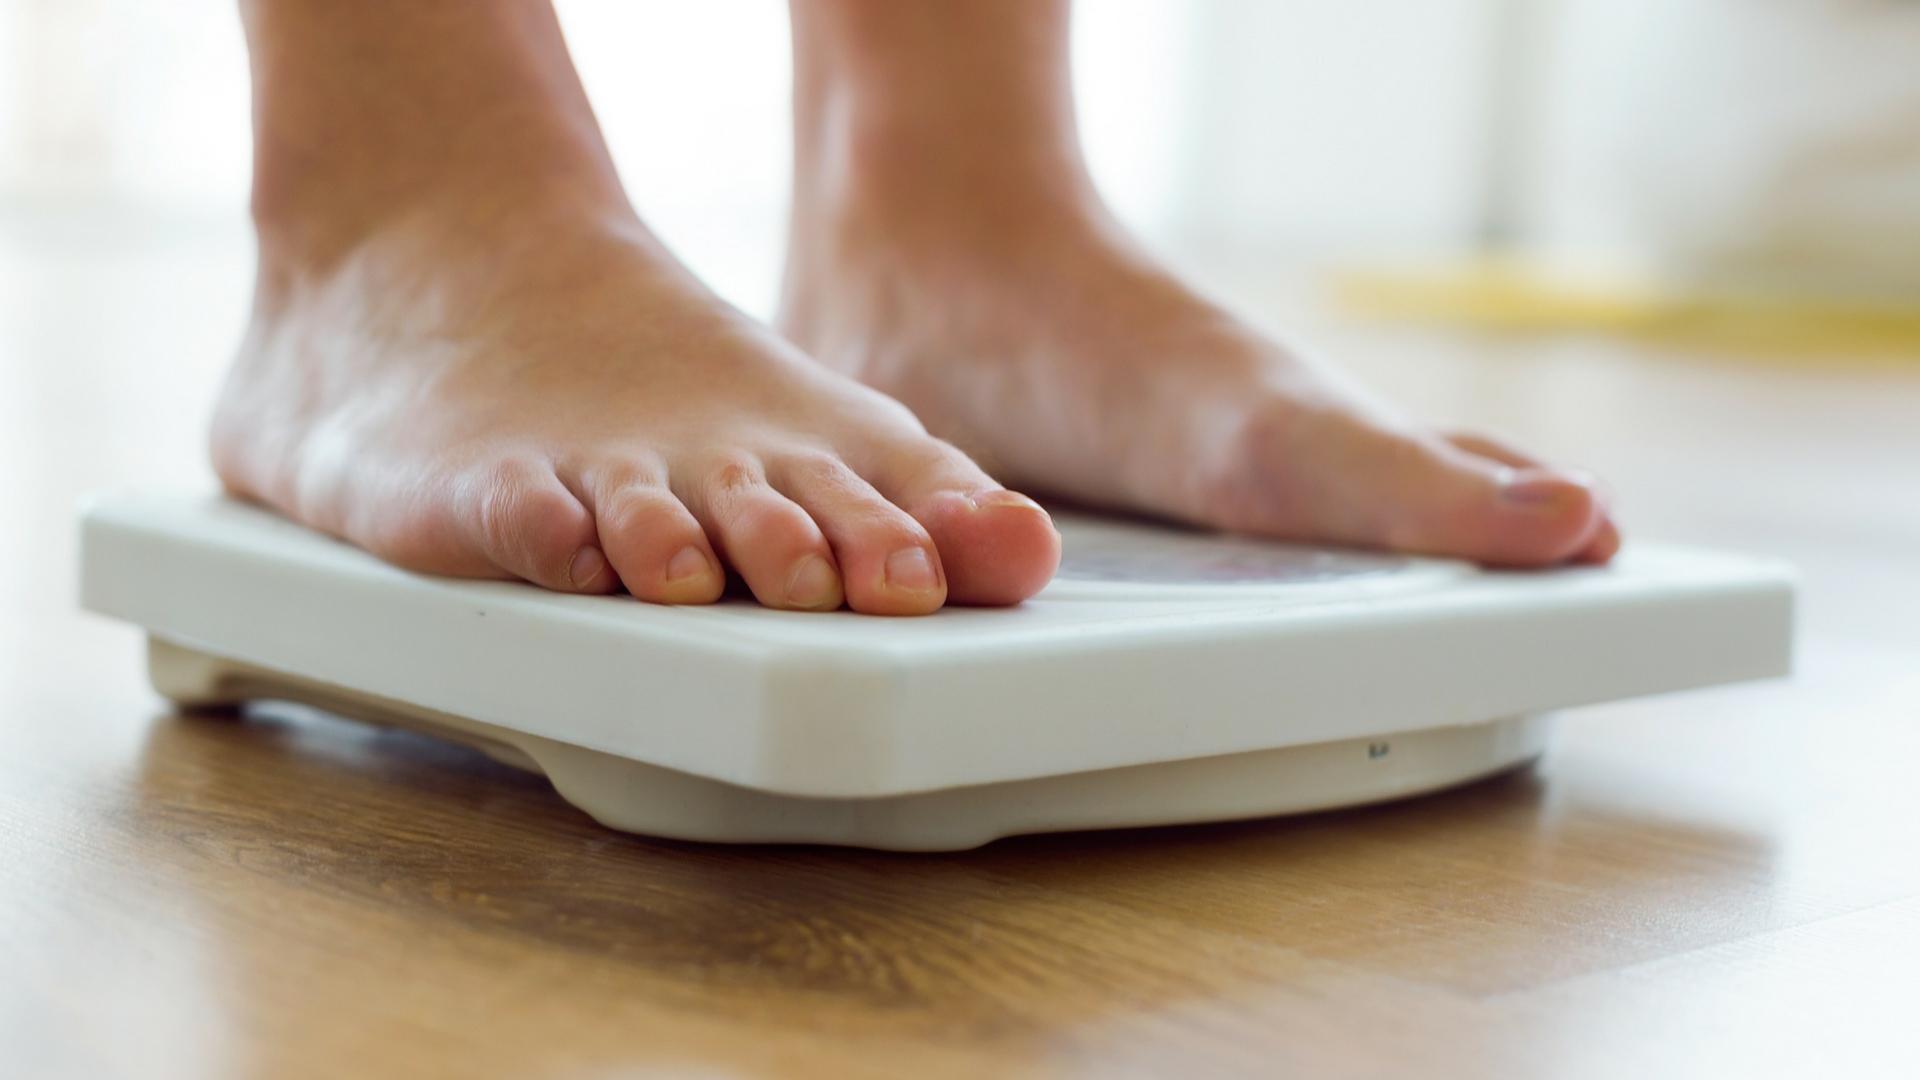 BodyBarista body measurement app